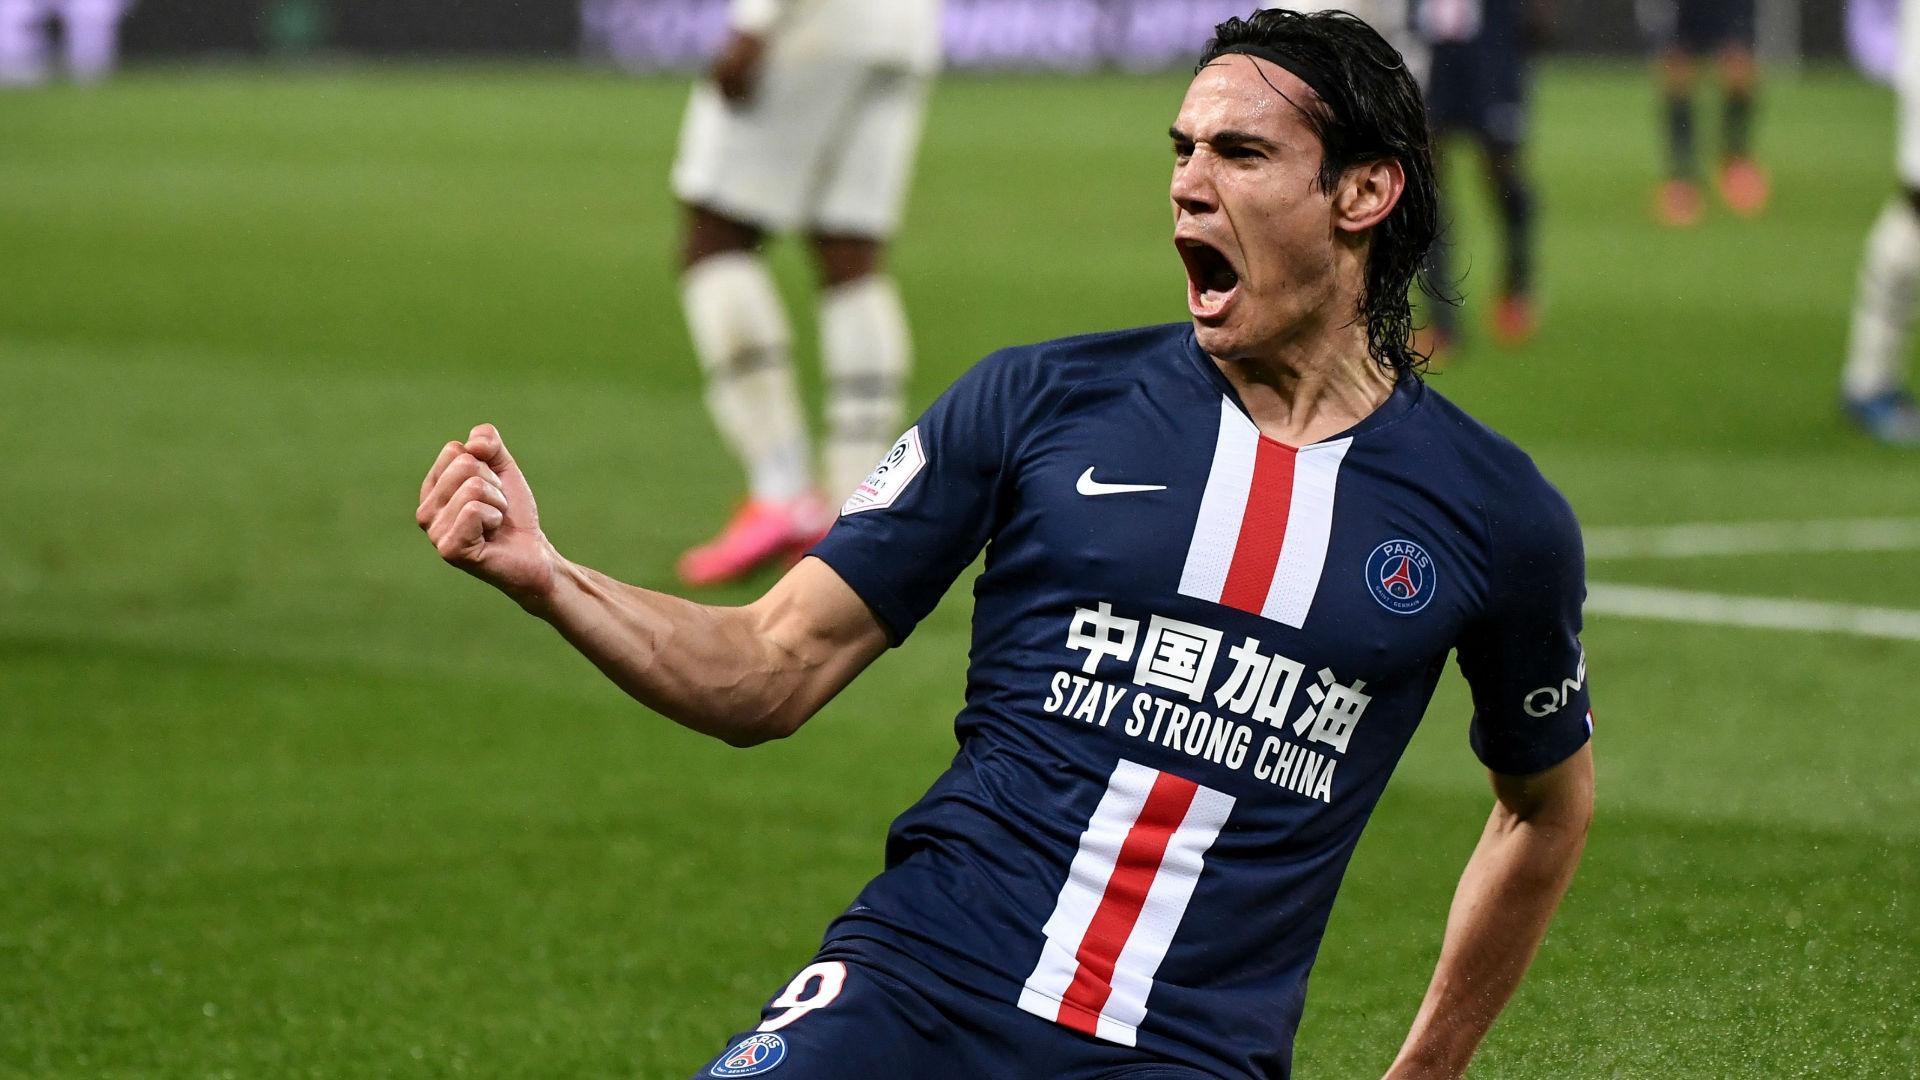 Cavani reaches 200-goal milestone in PSG's win over Bordeaux